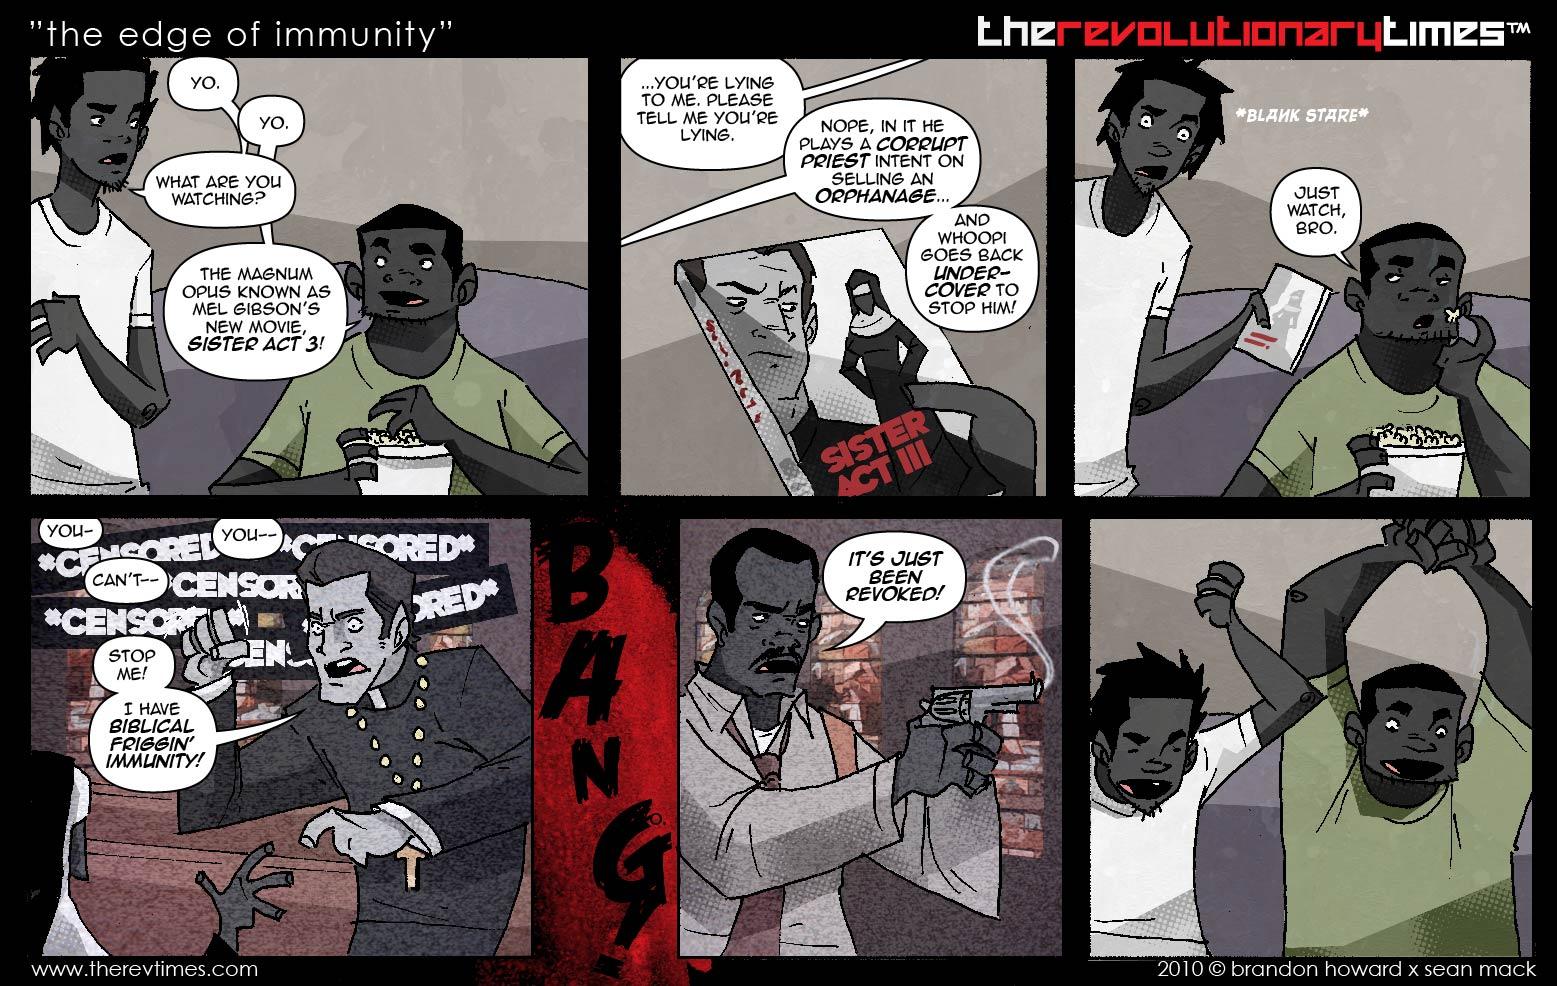 2010-07-19-edge-of-immunity-01.jpg